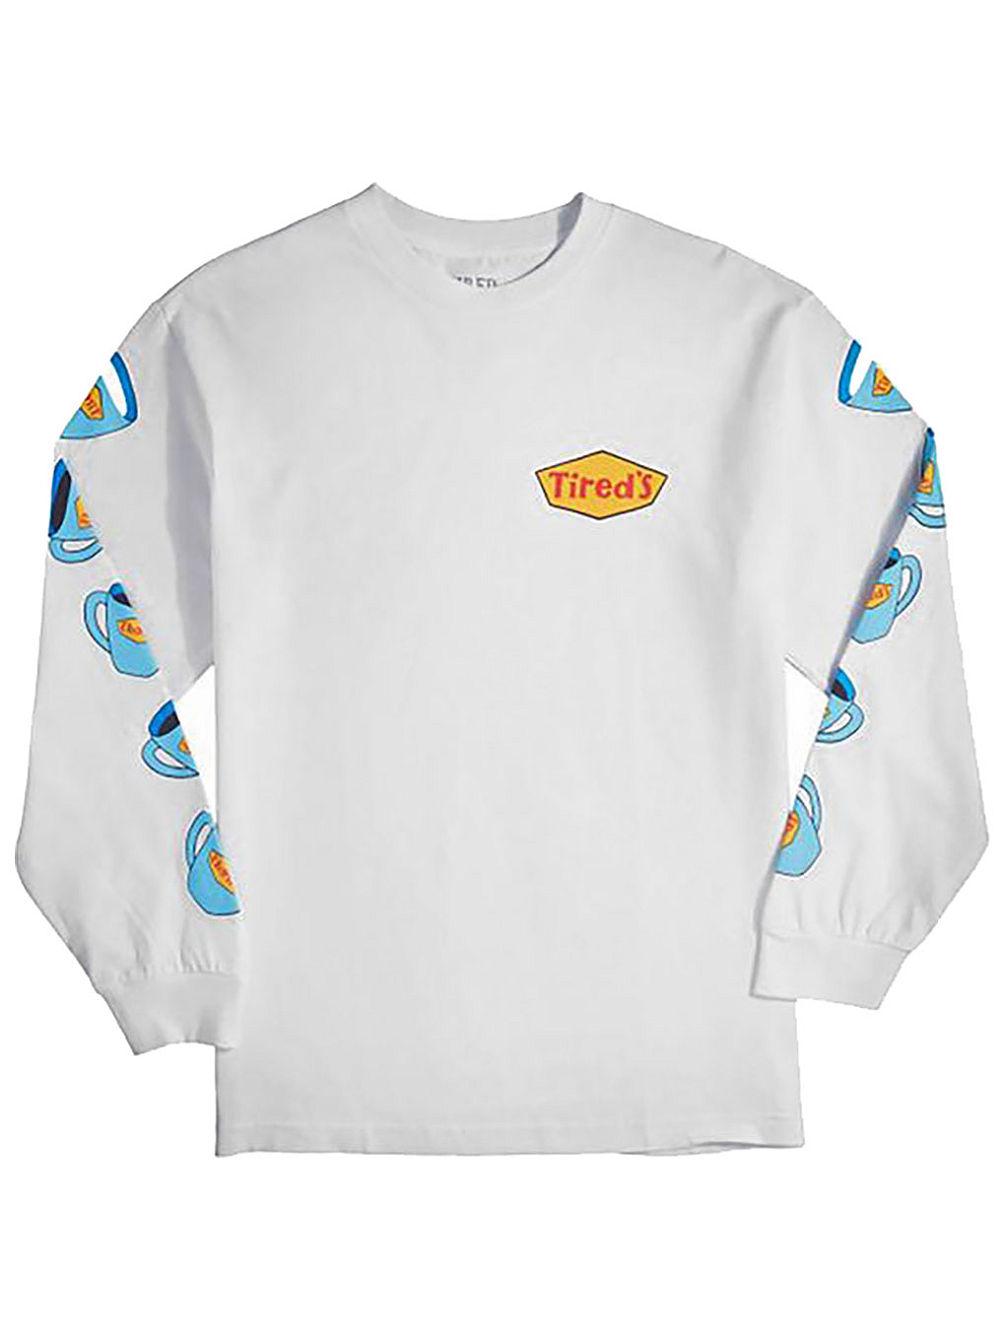 21360e9c Buy Tired Diner Long Sleeve T-Shirt online at Blue Tomato